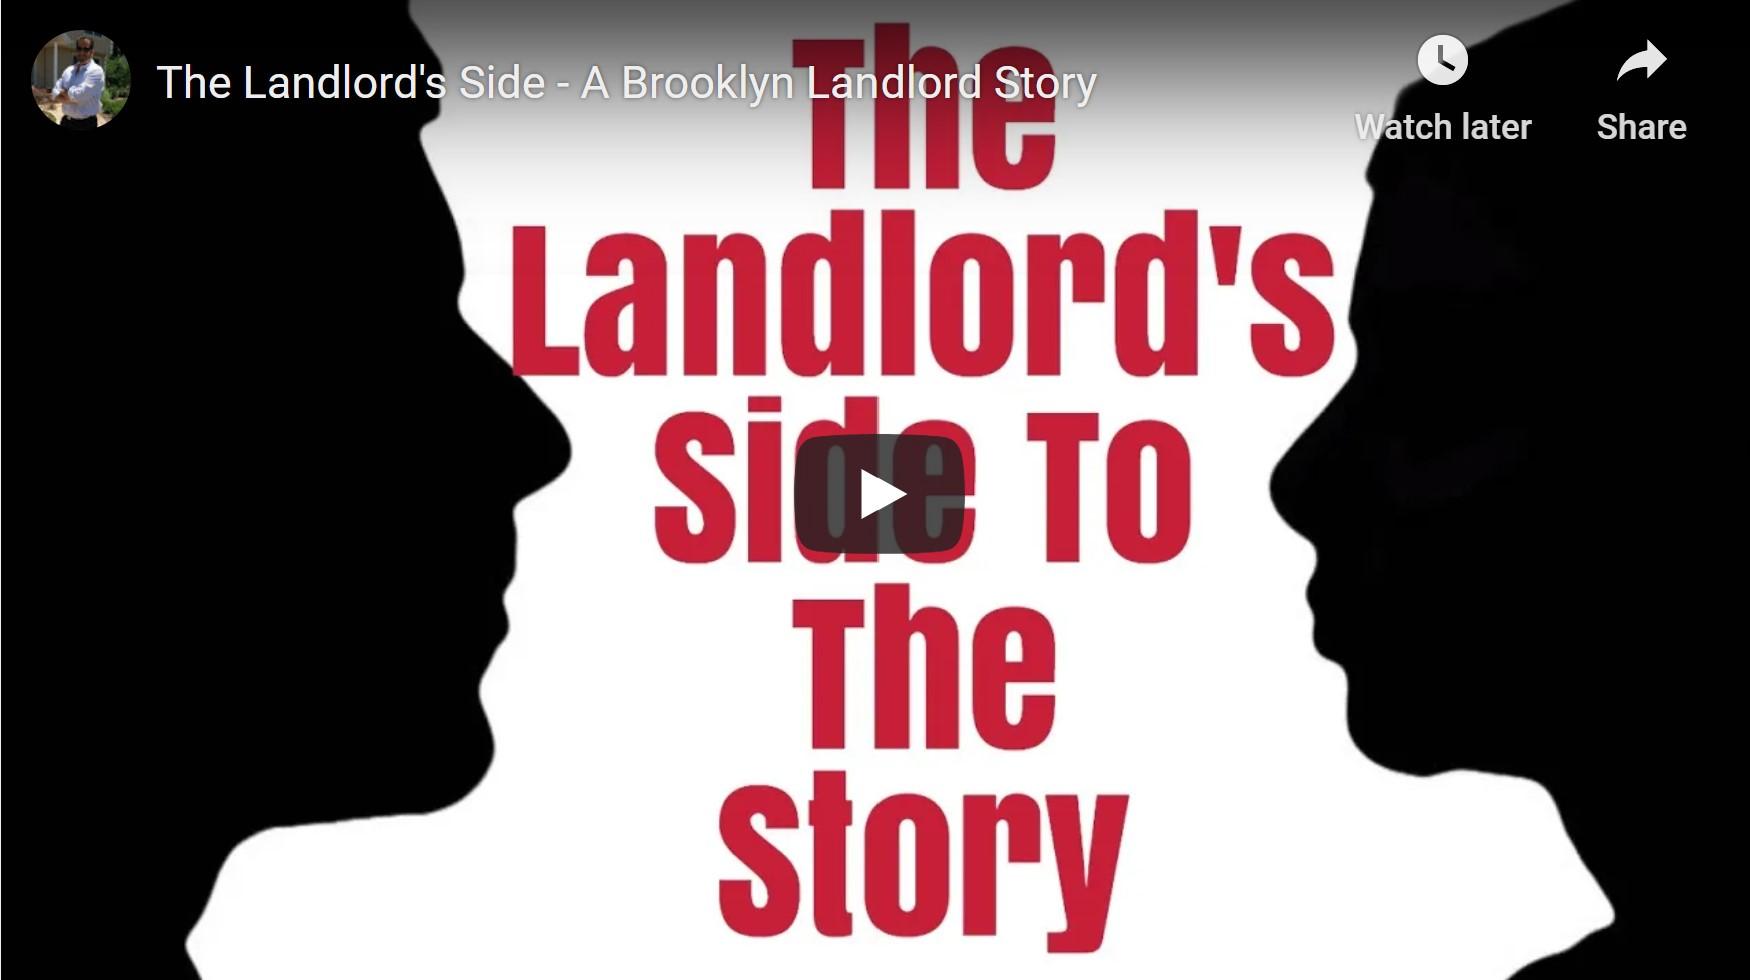 A Brooklyn Landlords Story